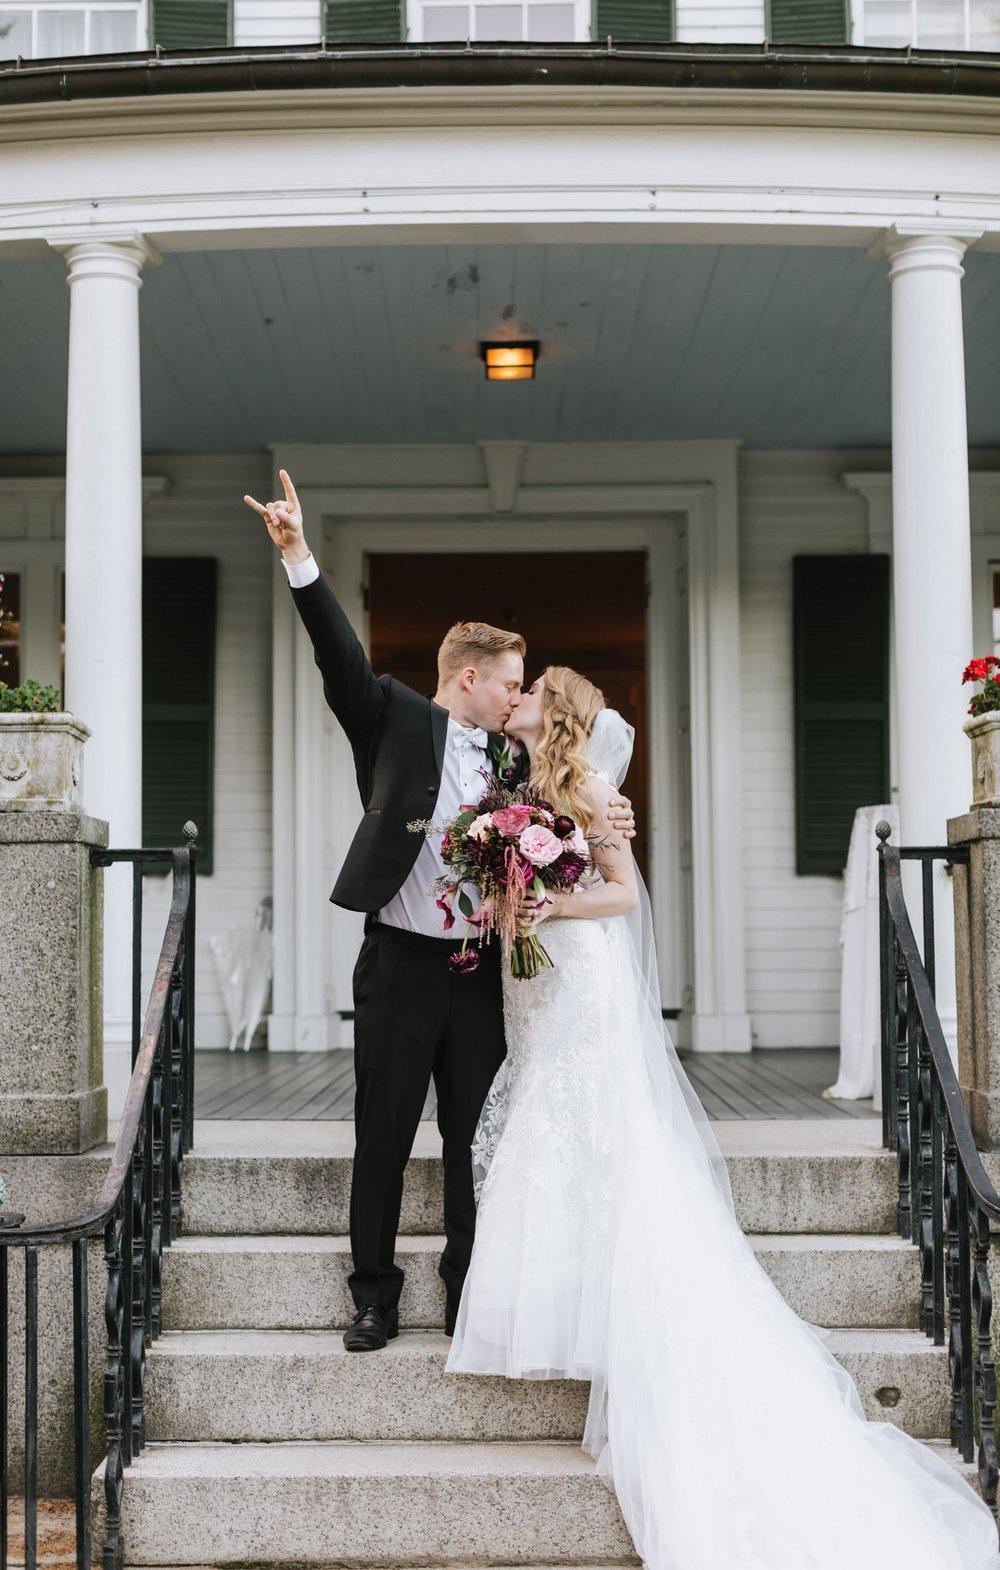 Glen_Magna_Farms_Wedding_Photographer-32.jpg